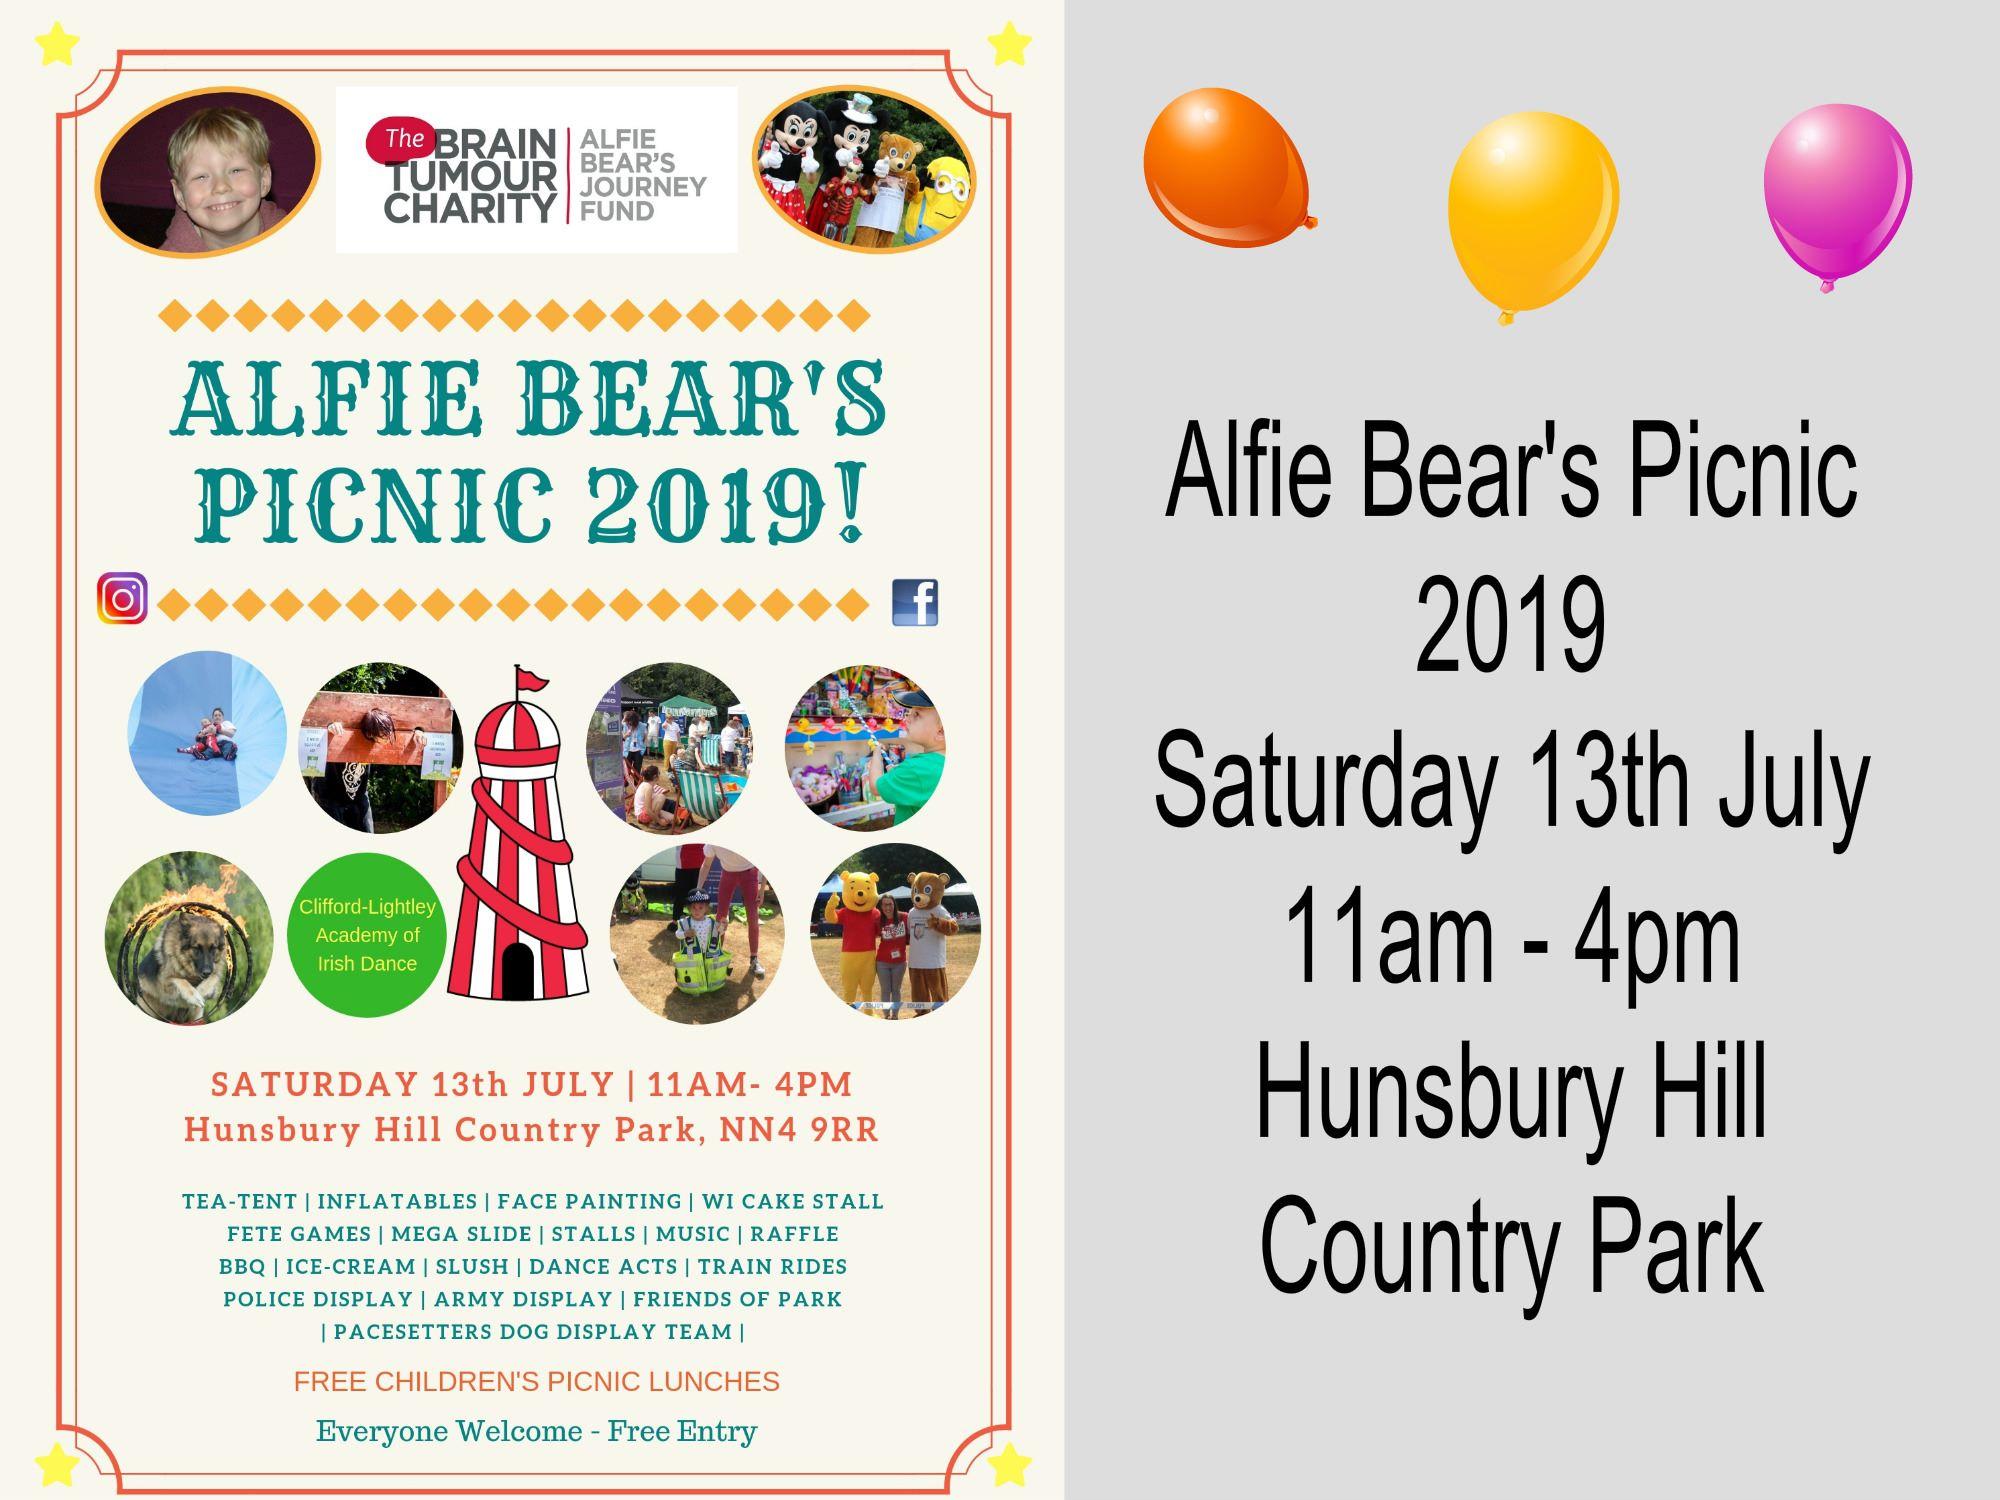 Alfie Bear's Picnic 2019